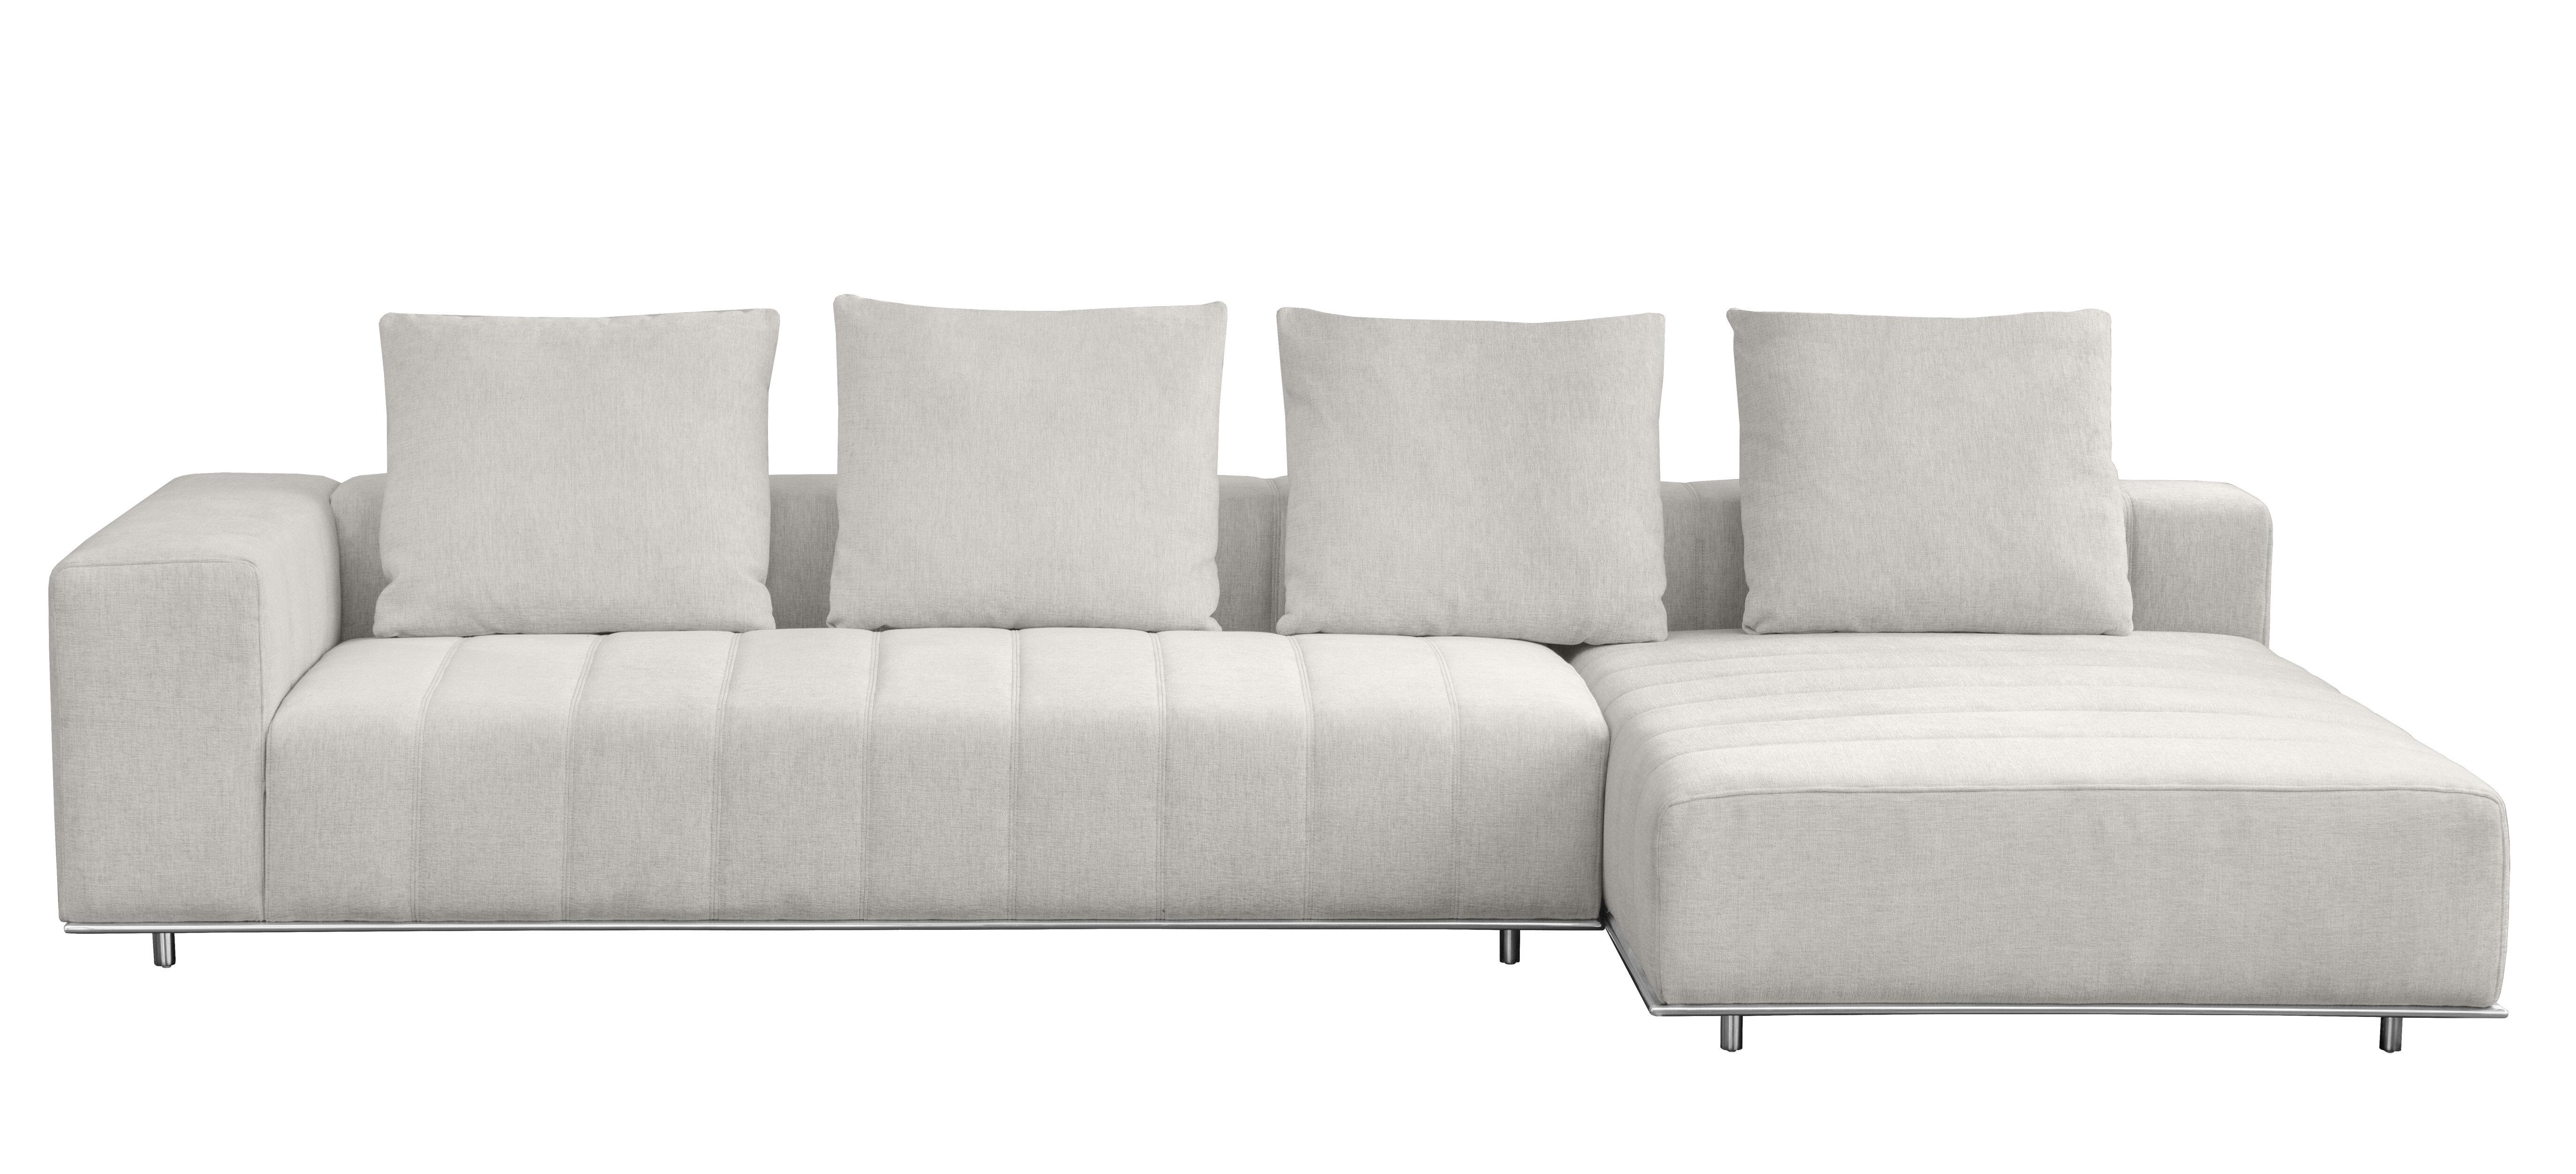 Outstanding Flora Modular Sectional Creativecarmelina Interior Chair Design Creativecarmelinacom